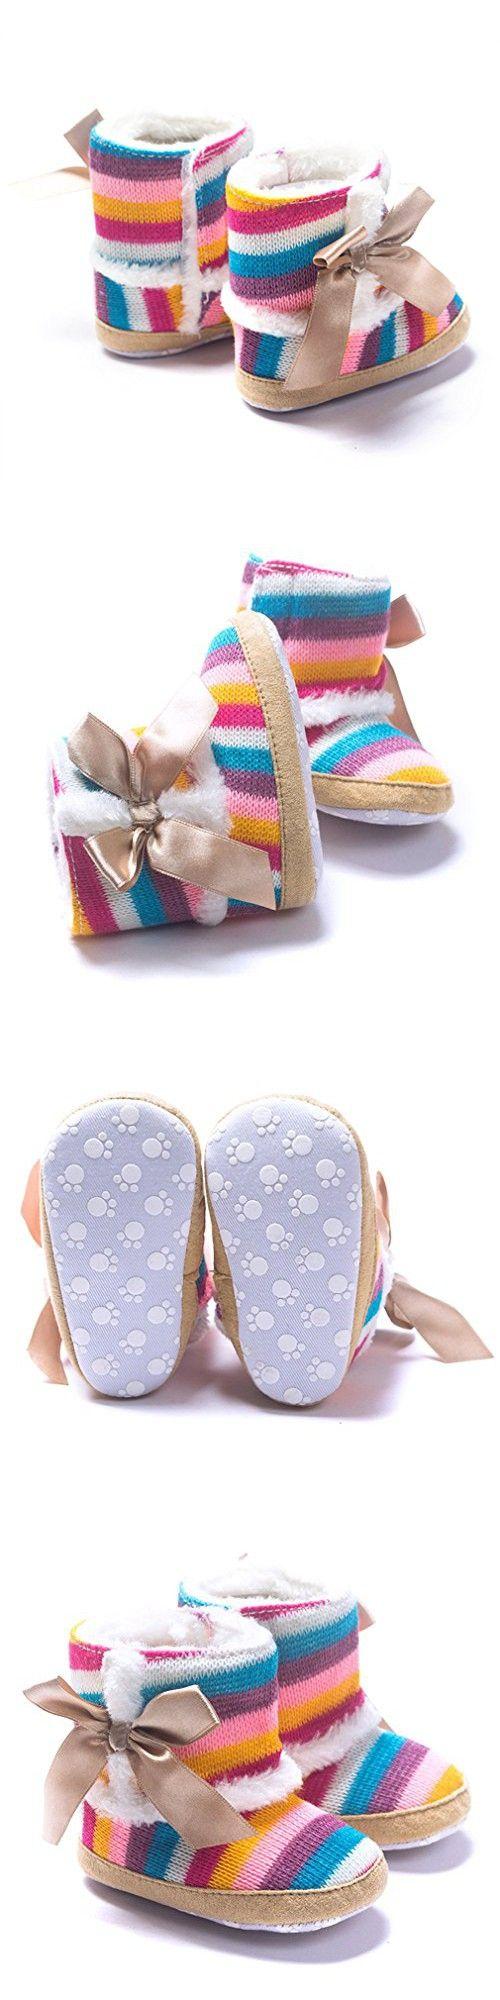 KaKaKi Infant Baby Prewalker Super Soft Cotton Anti-Slip Sole Toddler Winter Boots Rainbow,12